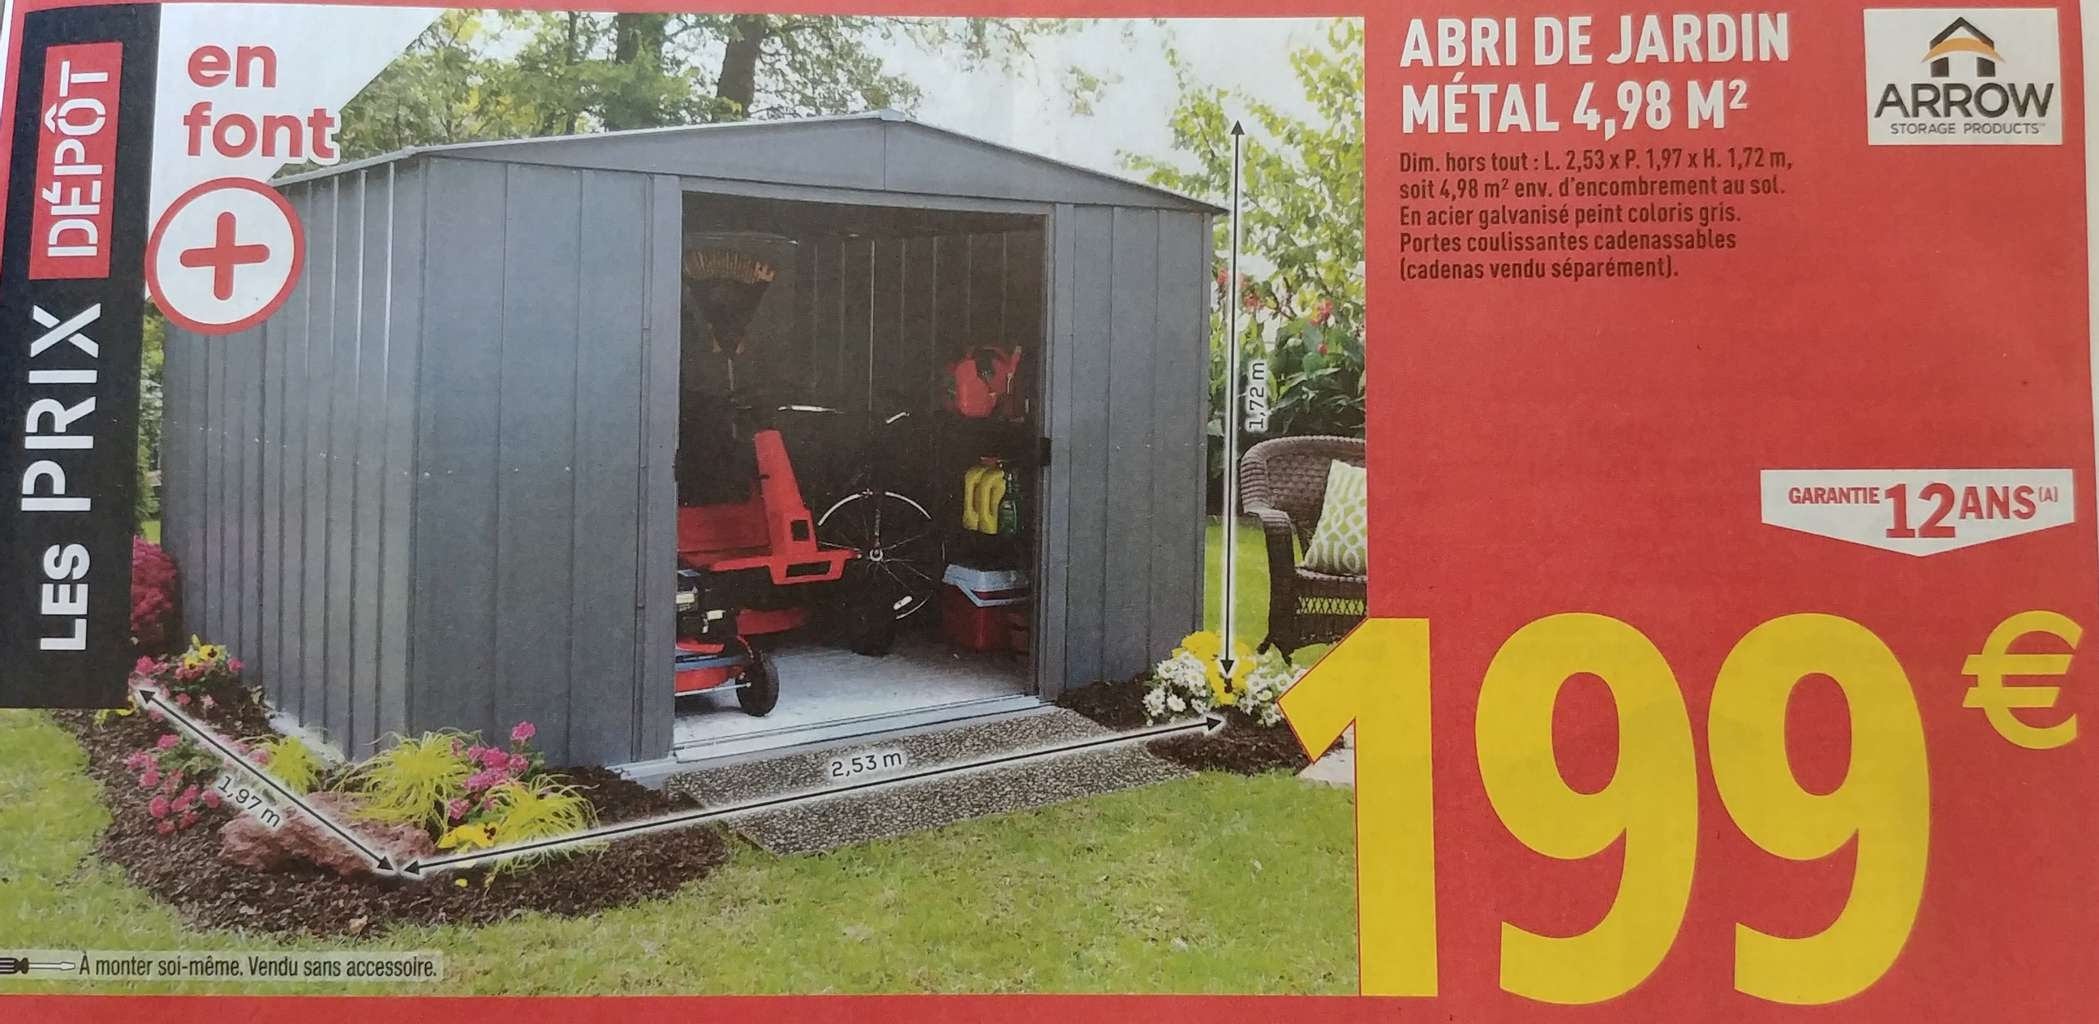 Abri De Jardin Métal Arrow - 4.98M², 2.53 X 1.97 M – Dealabs encequiconcerne Abri De Jardin Arrow 4,98 M2